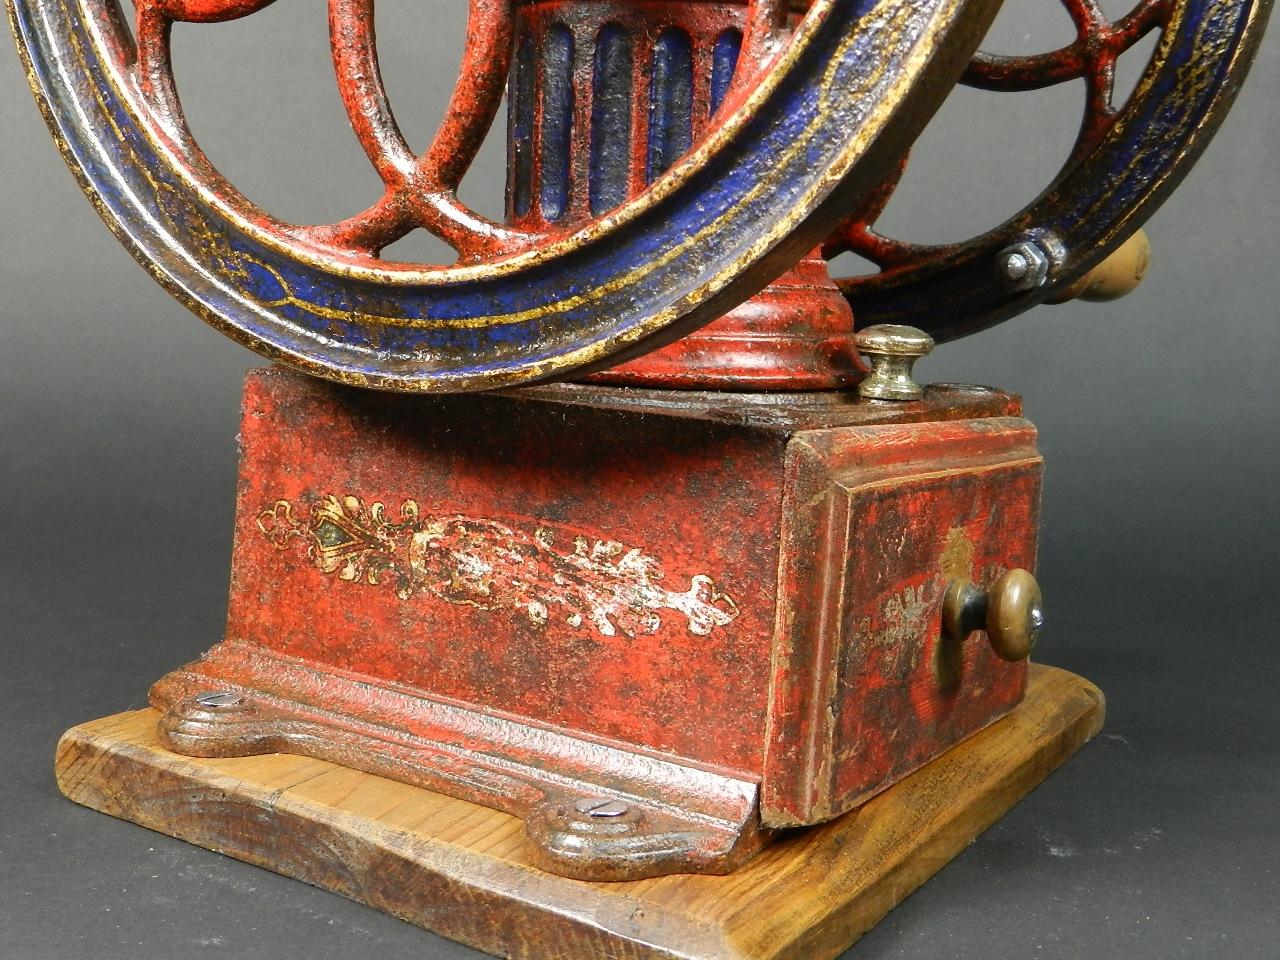 Imagen MOLINILLO CAFE J.M.B Nº1 AÑO 1890 38290